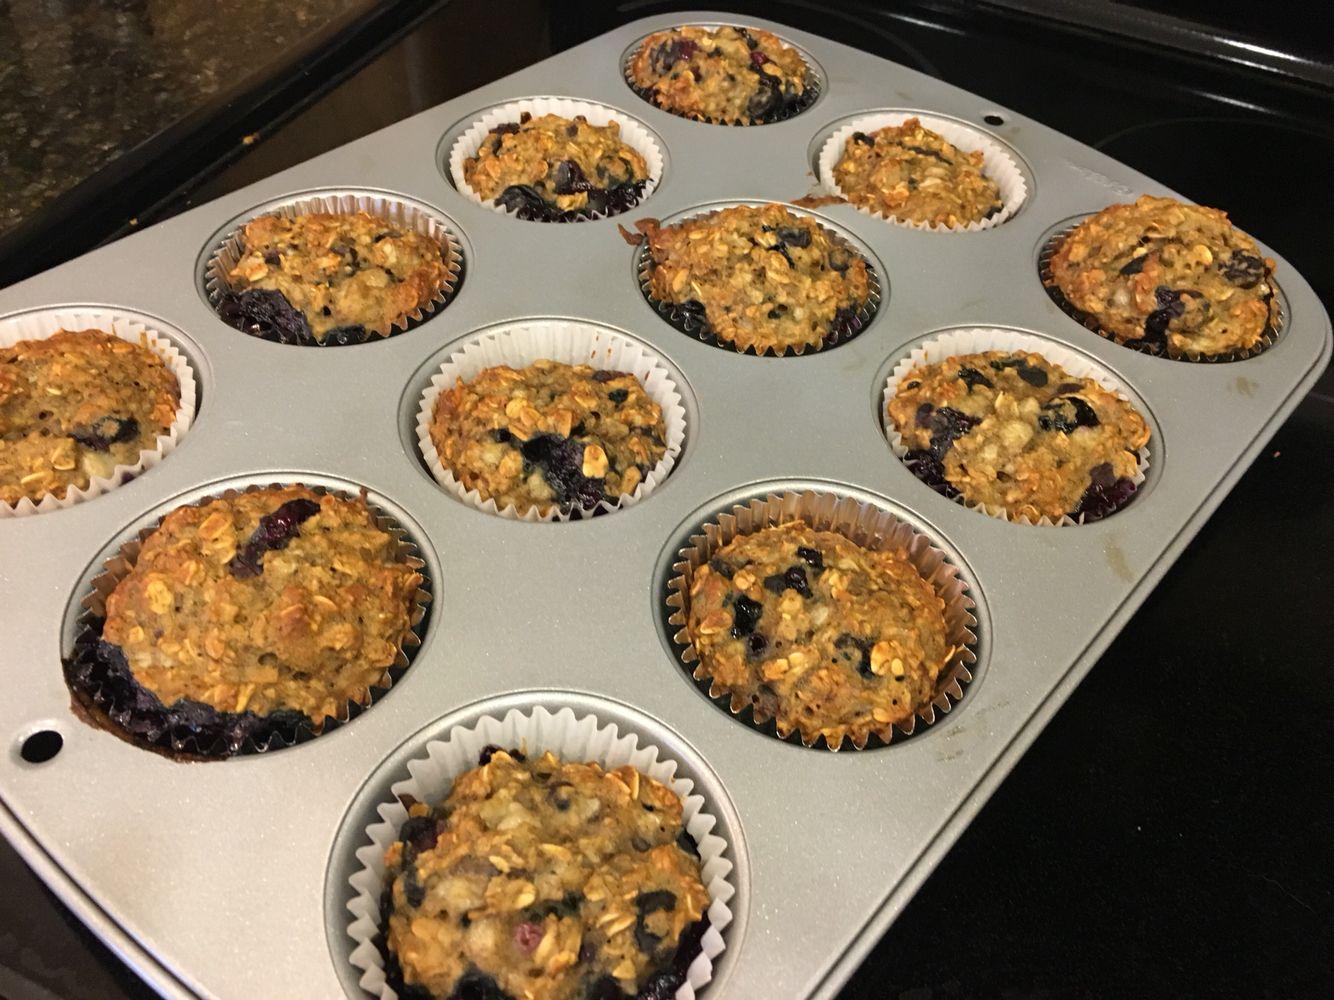 Banana oat blueberry muffin for baby - no added sugar!   3 bananas mashed 1 cup blueberries 1 c flour 1 1/2 cup Oates 1tsp baking soda  1tsp baking powder 1 egg 1 tsp vanilla  1 tsp cinnamon  Bake at 350 for 25 min